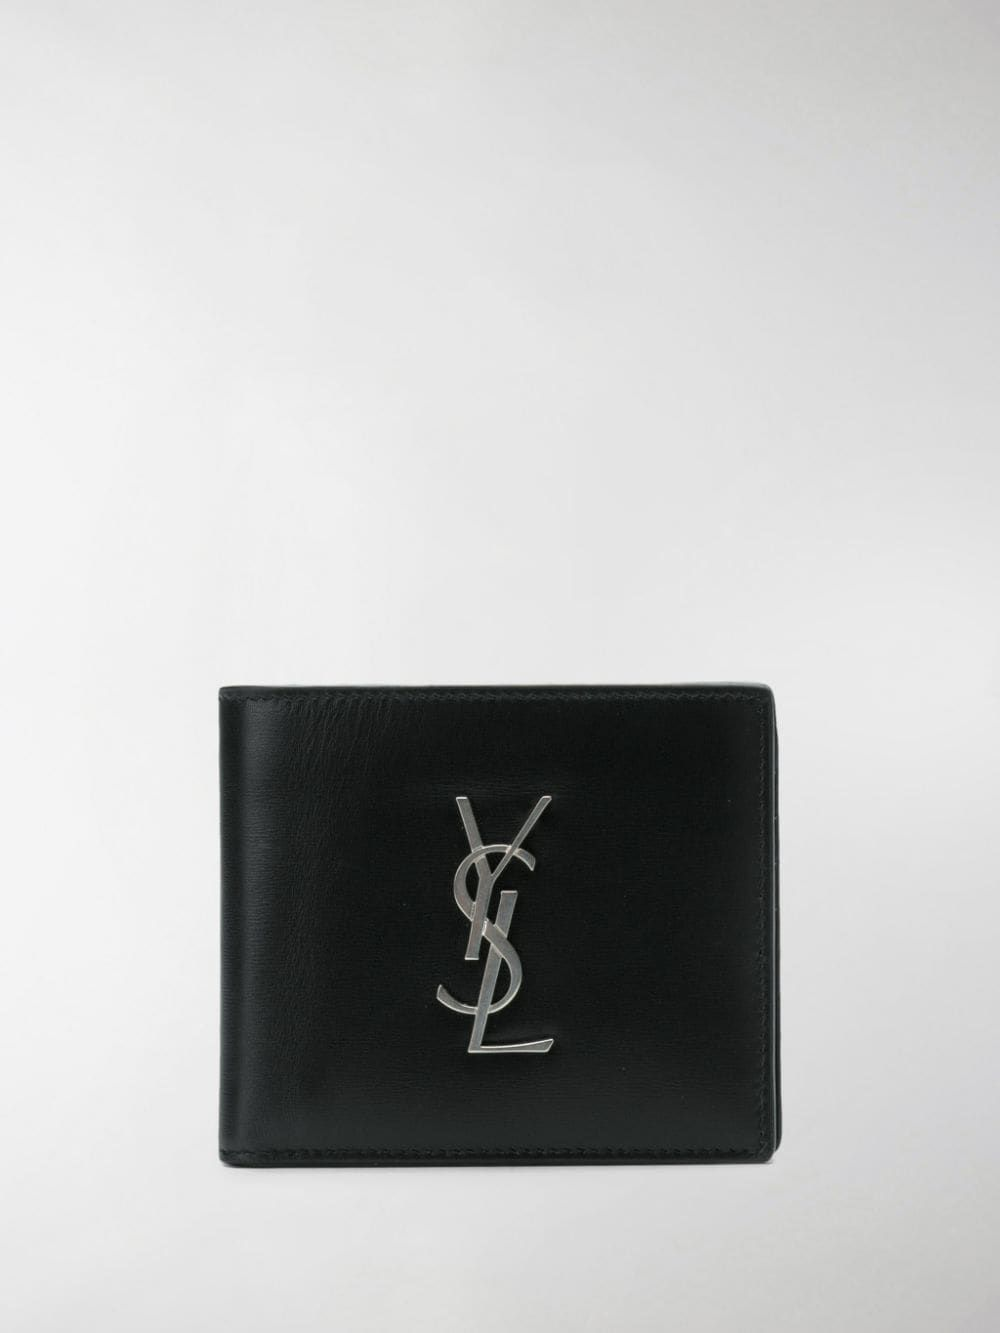 Saint laurent portafogli nero - Saint Laurent